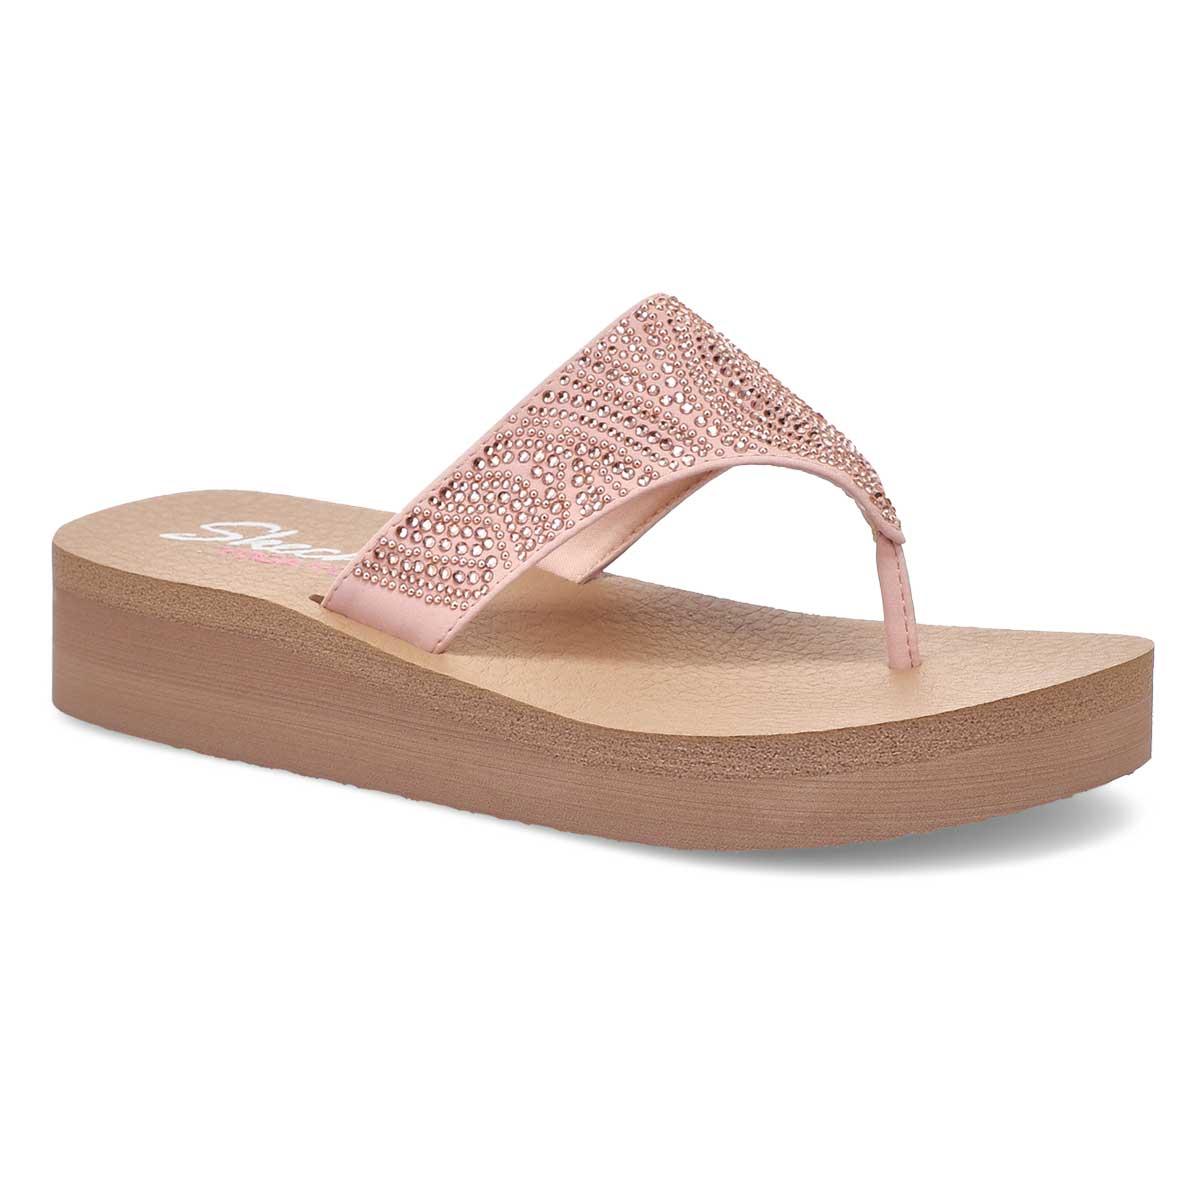 Sandale tong VINYASA STONE CANDY rosé,femmes